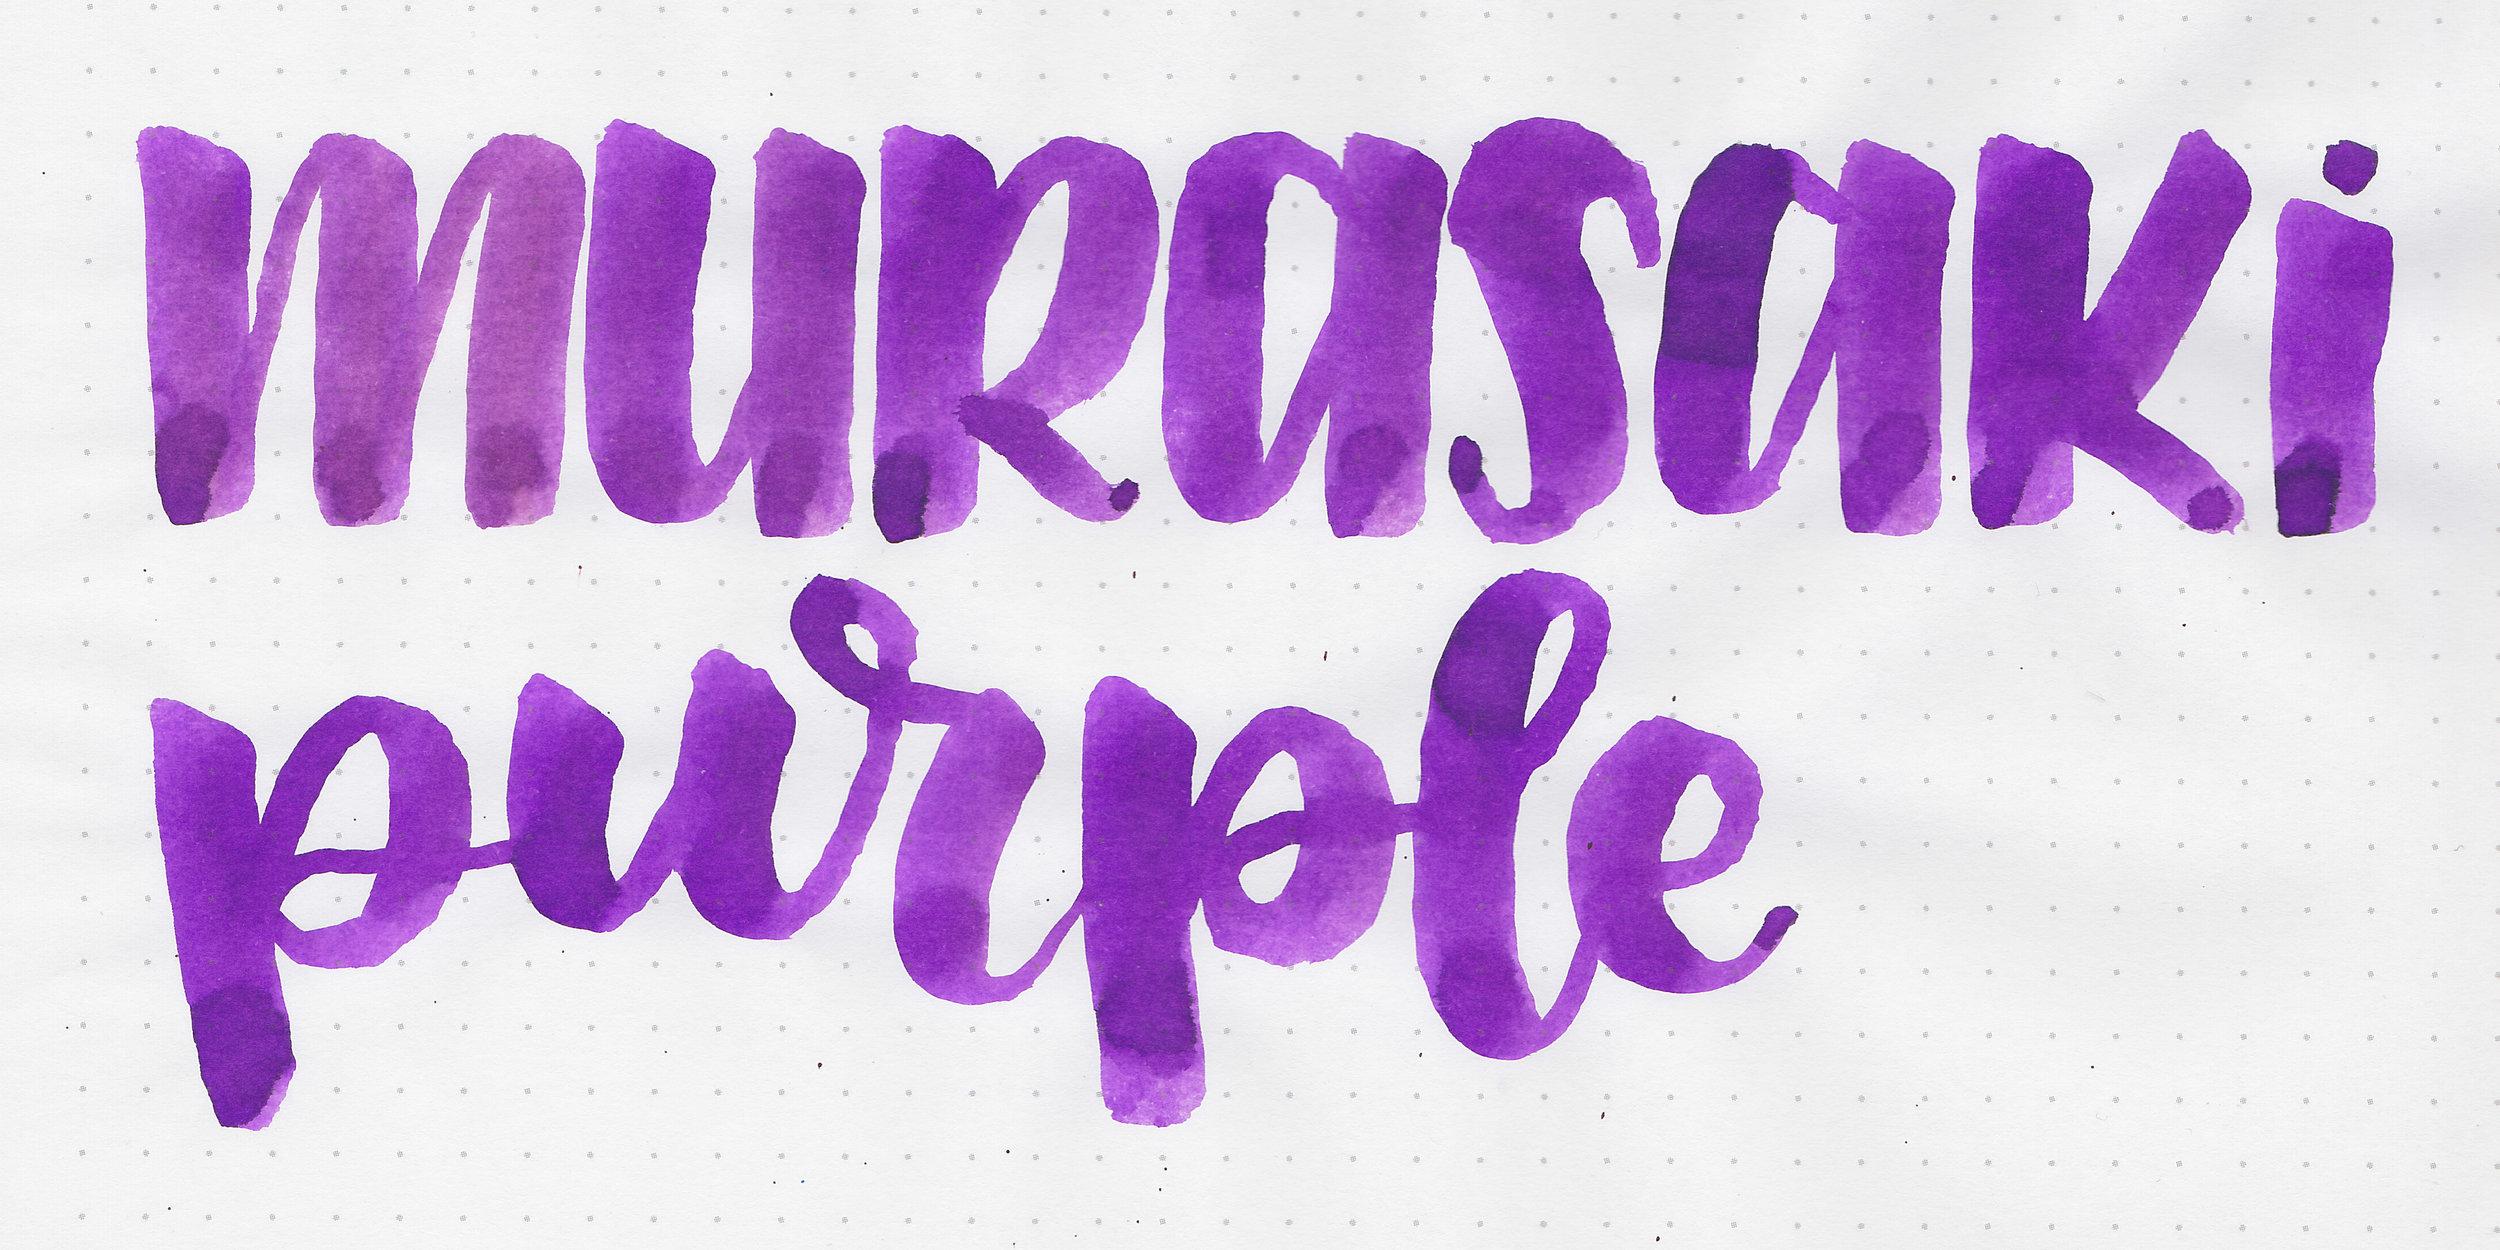 tac-murasaki-purple-4.jpg